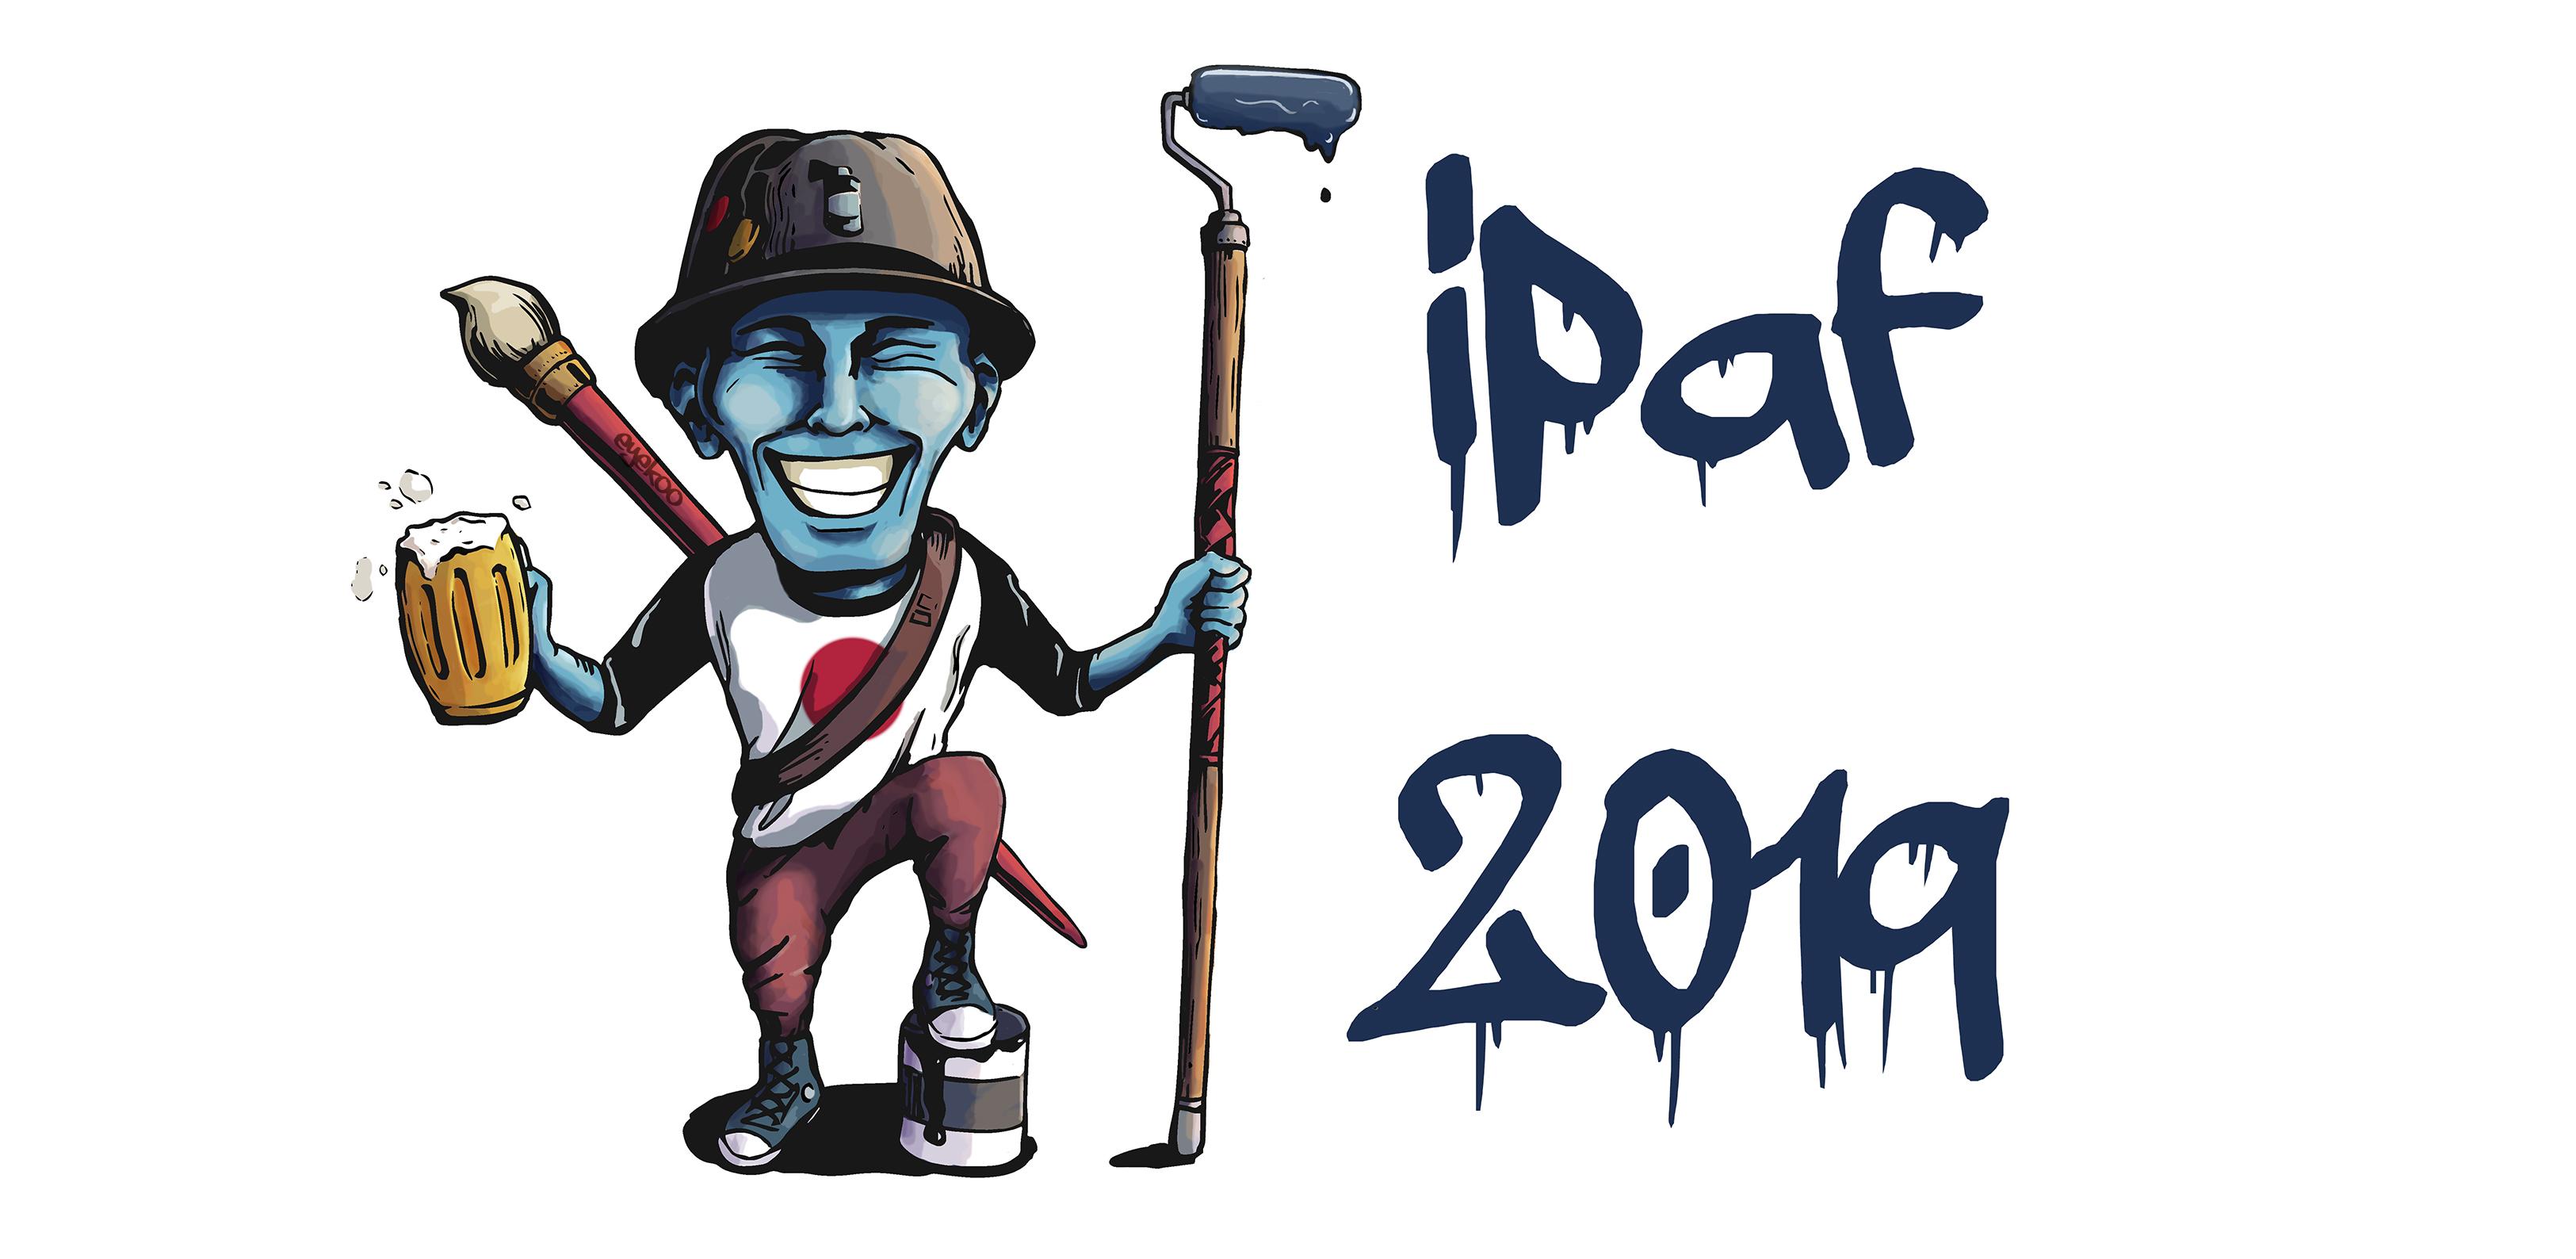 Ipaf painter2long